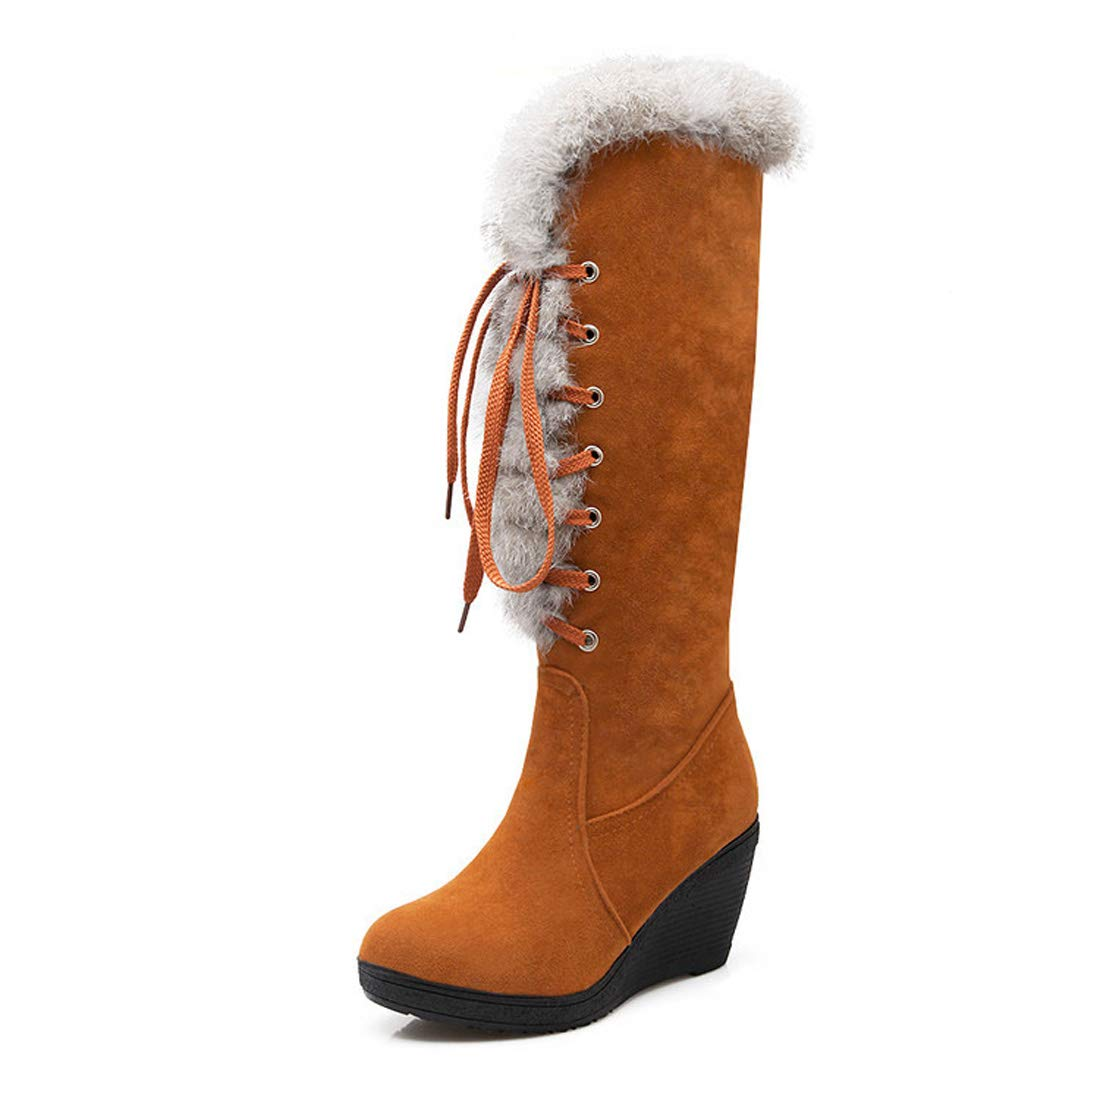 DANDANJIE Damen Kniehohe Stiefel Stiefel Stiefel Keilabsatz Lace-up Fashion Stiefel Schuhe für 2018 Herbst Winter 1b487e